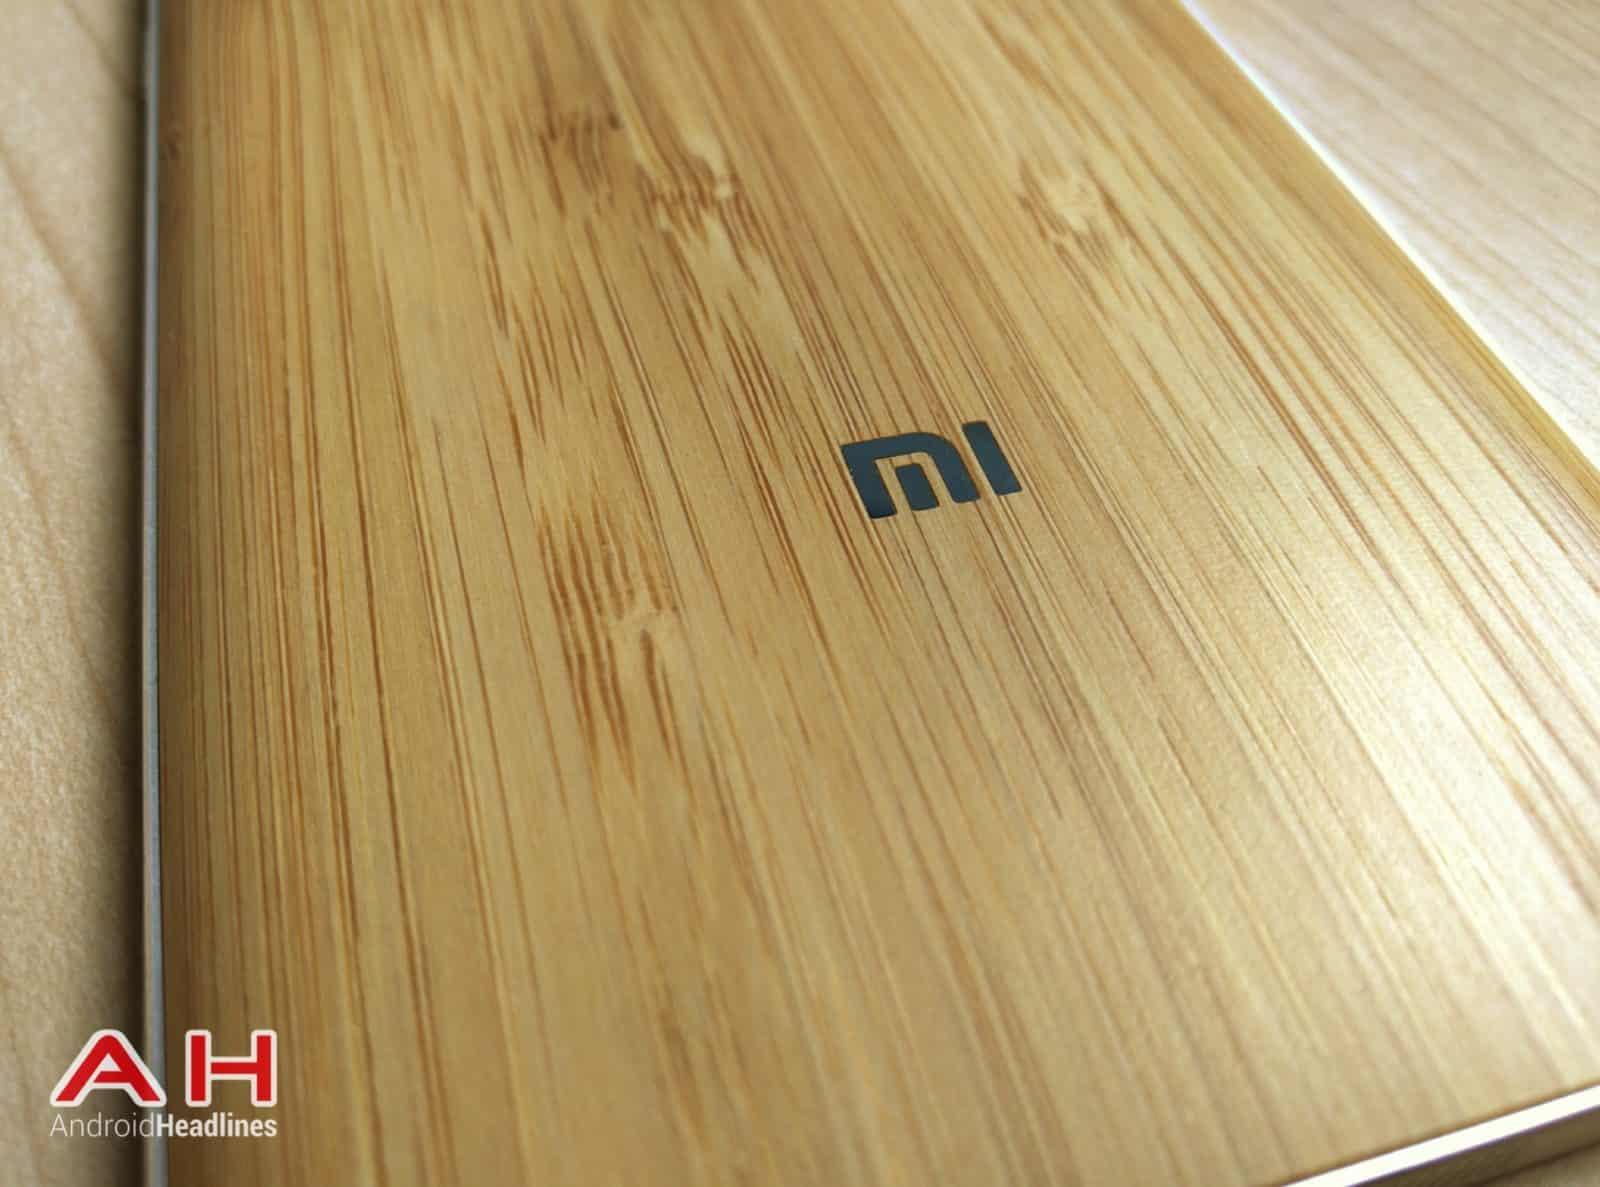 Xiaomi Mi 4 Bamboo AH